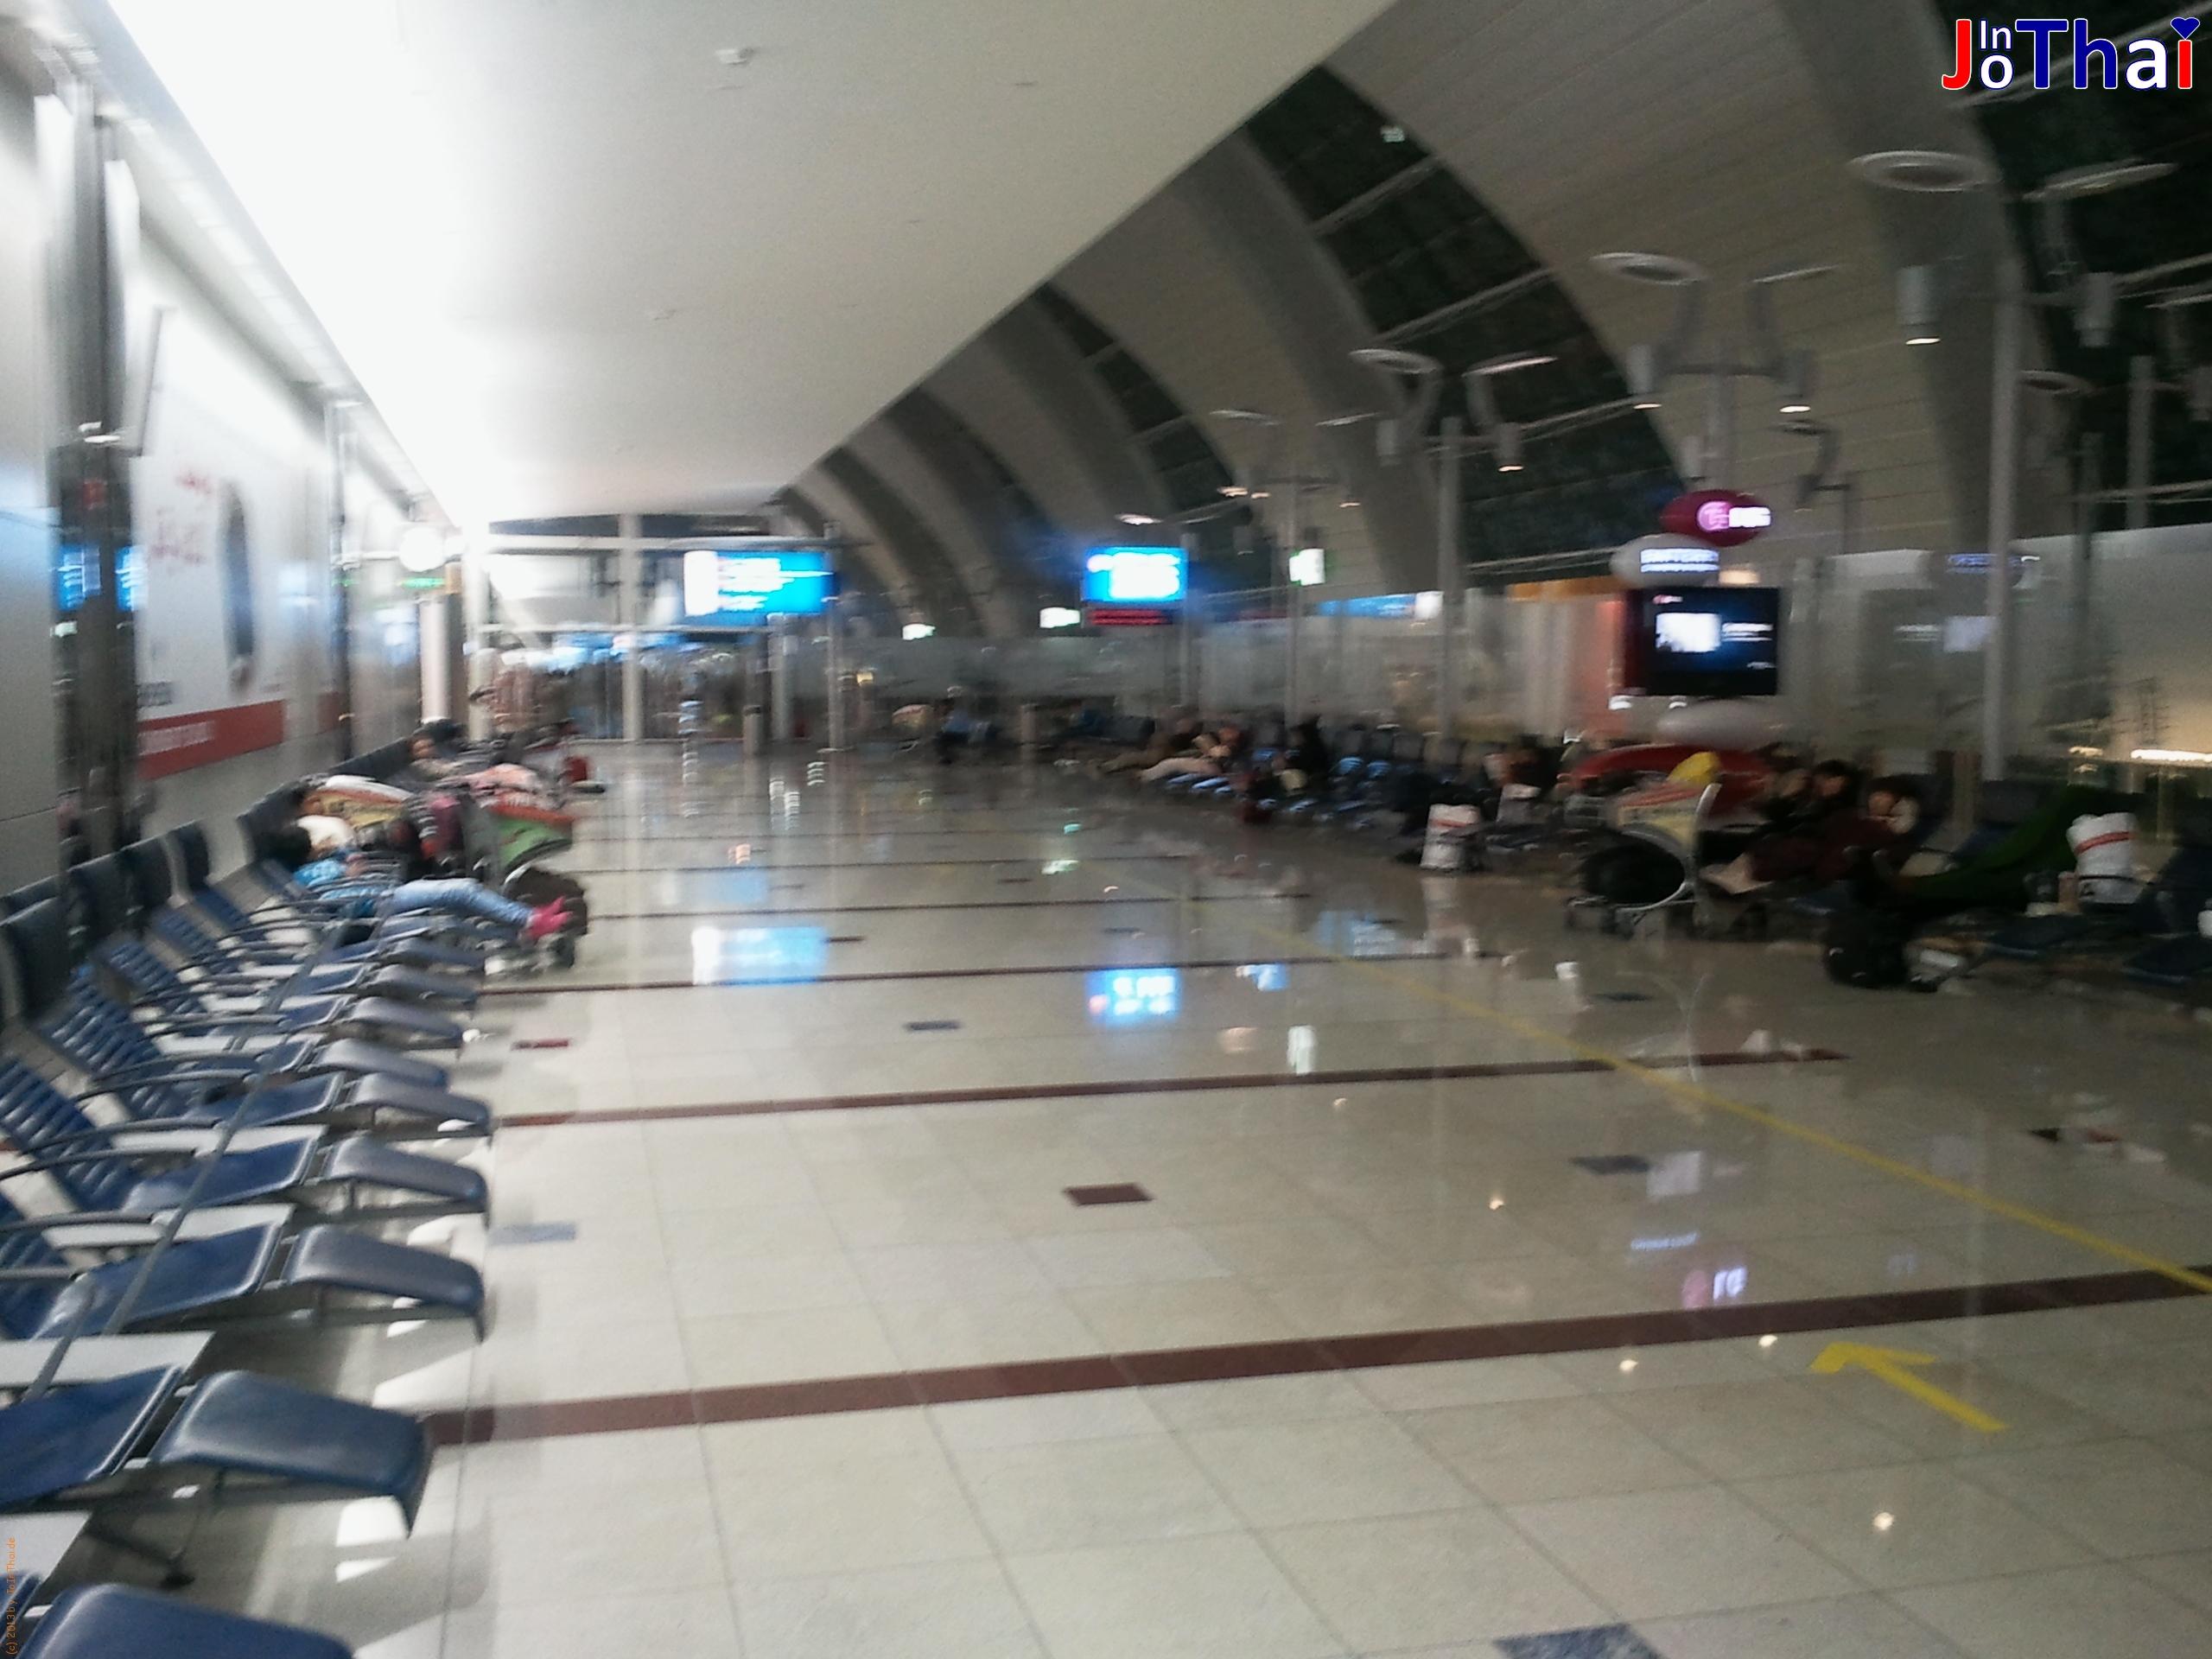 Dubai International Airport - Wartebereich am Gate